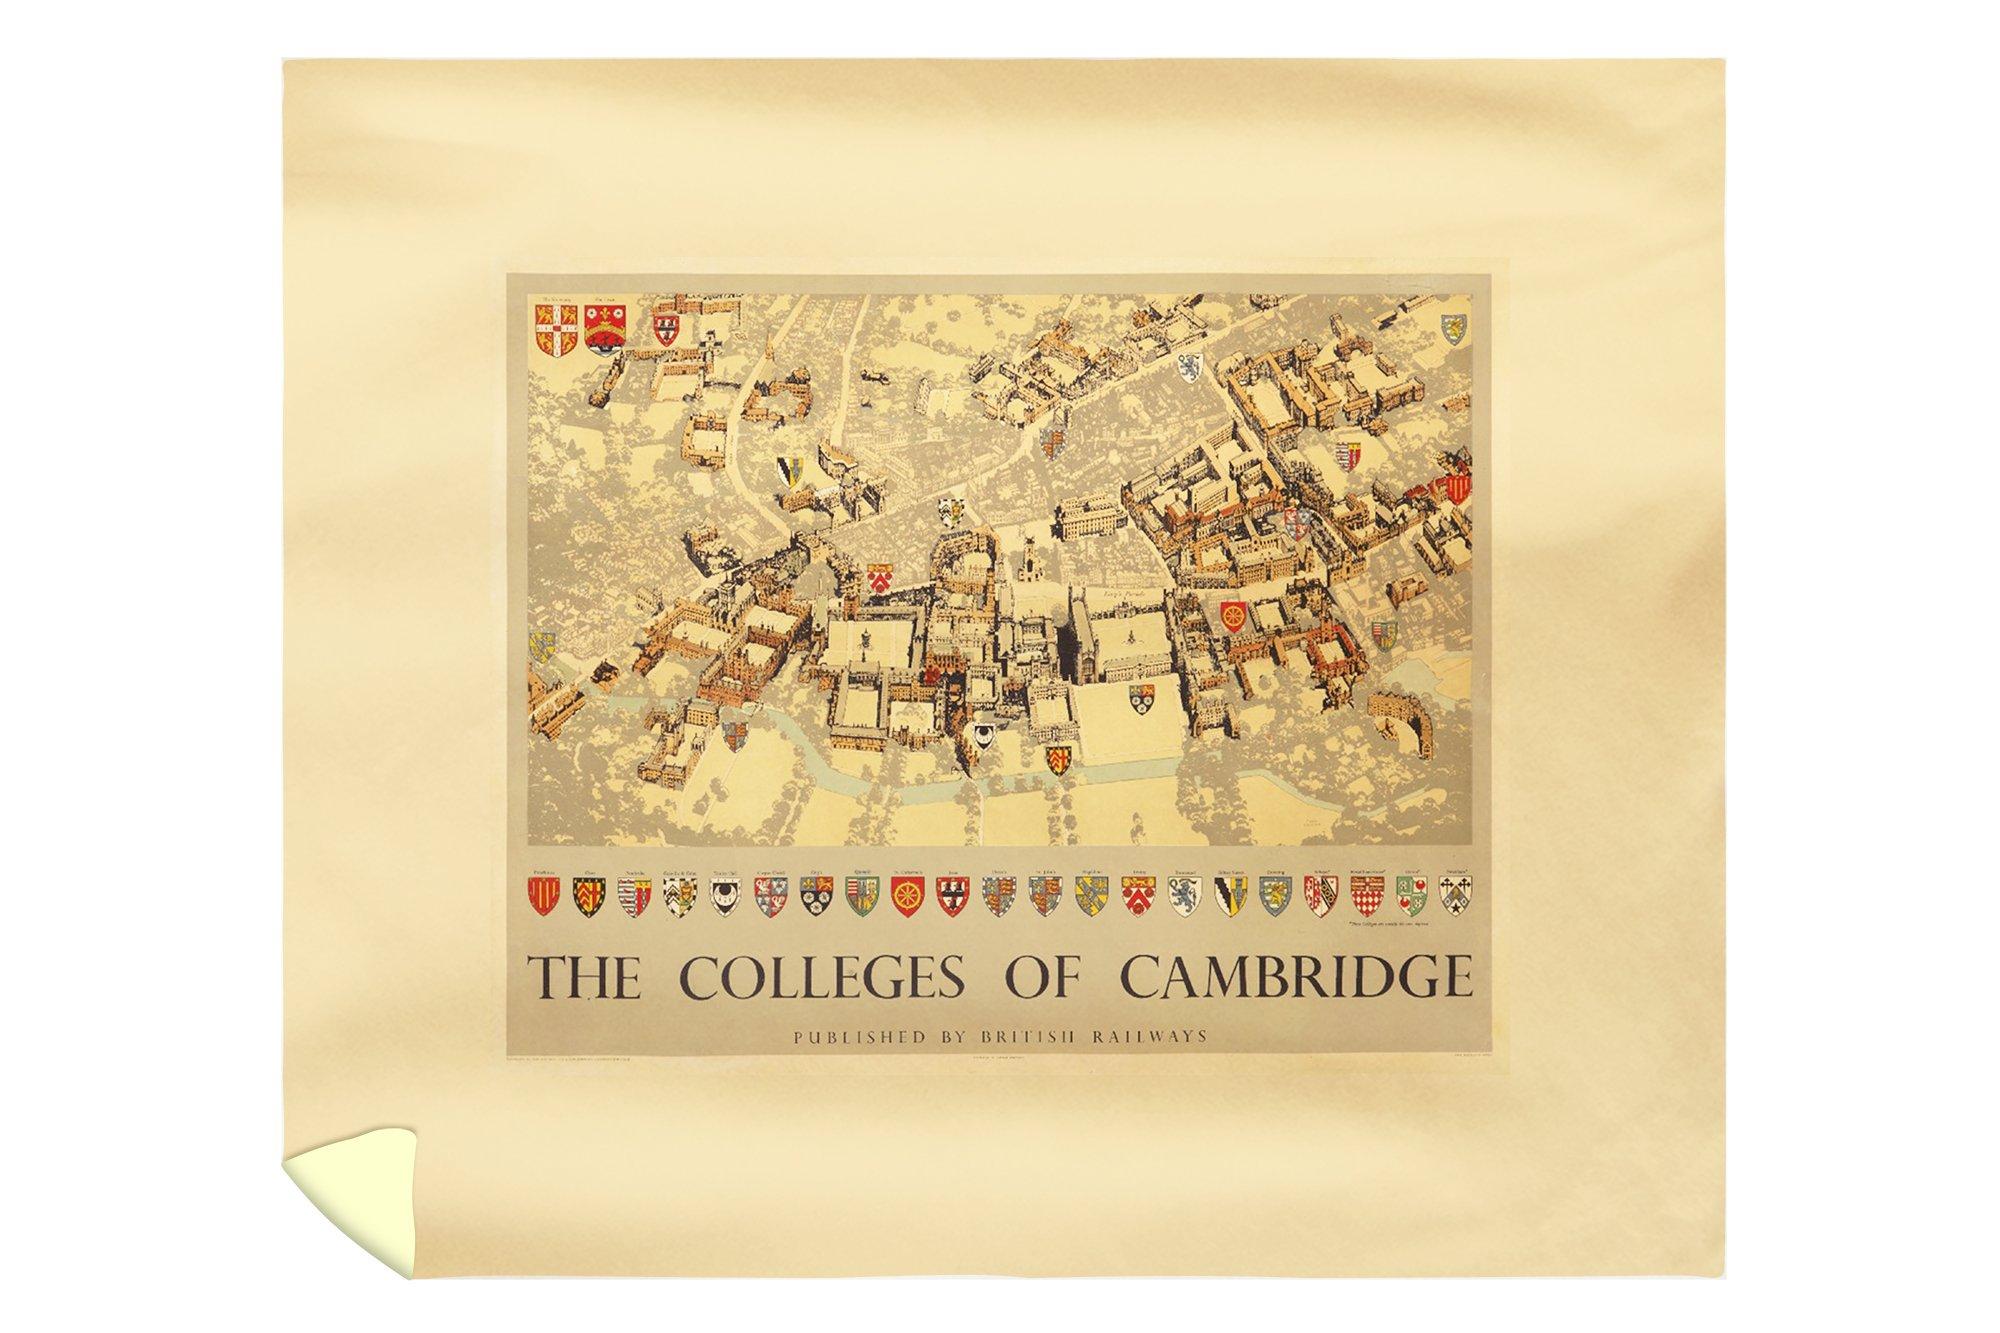 Colleges of Cambridge Vintage Poster (artist: Taylor, Fred) England c. 1935 (88x104 King Microfiber Duvet Cover)